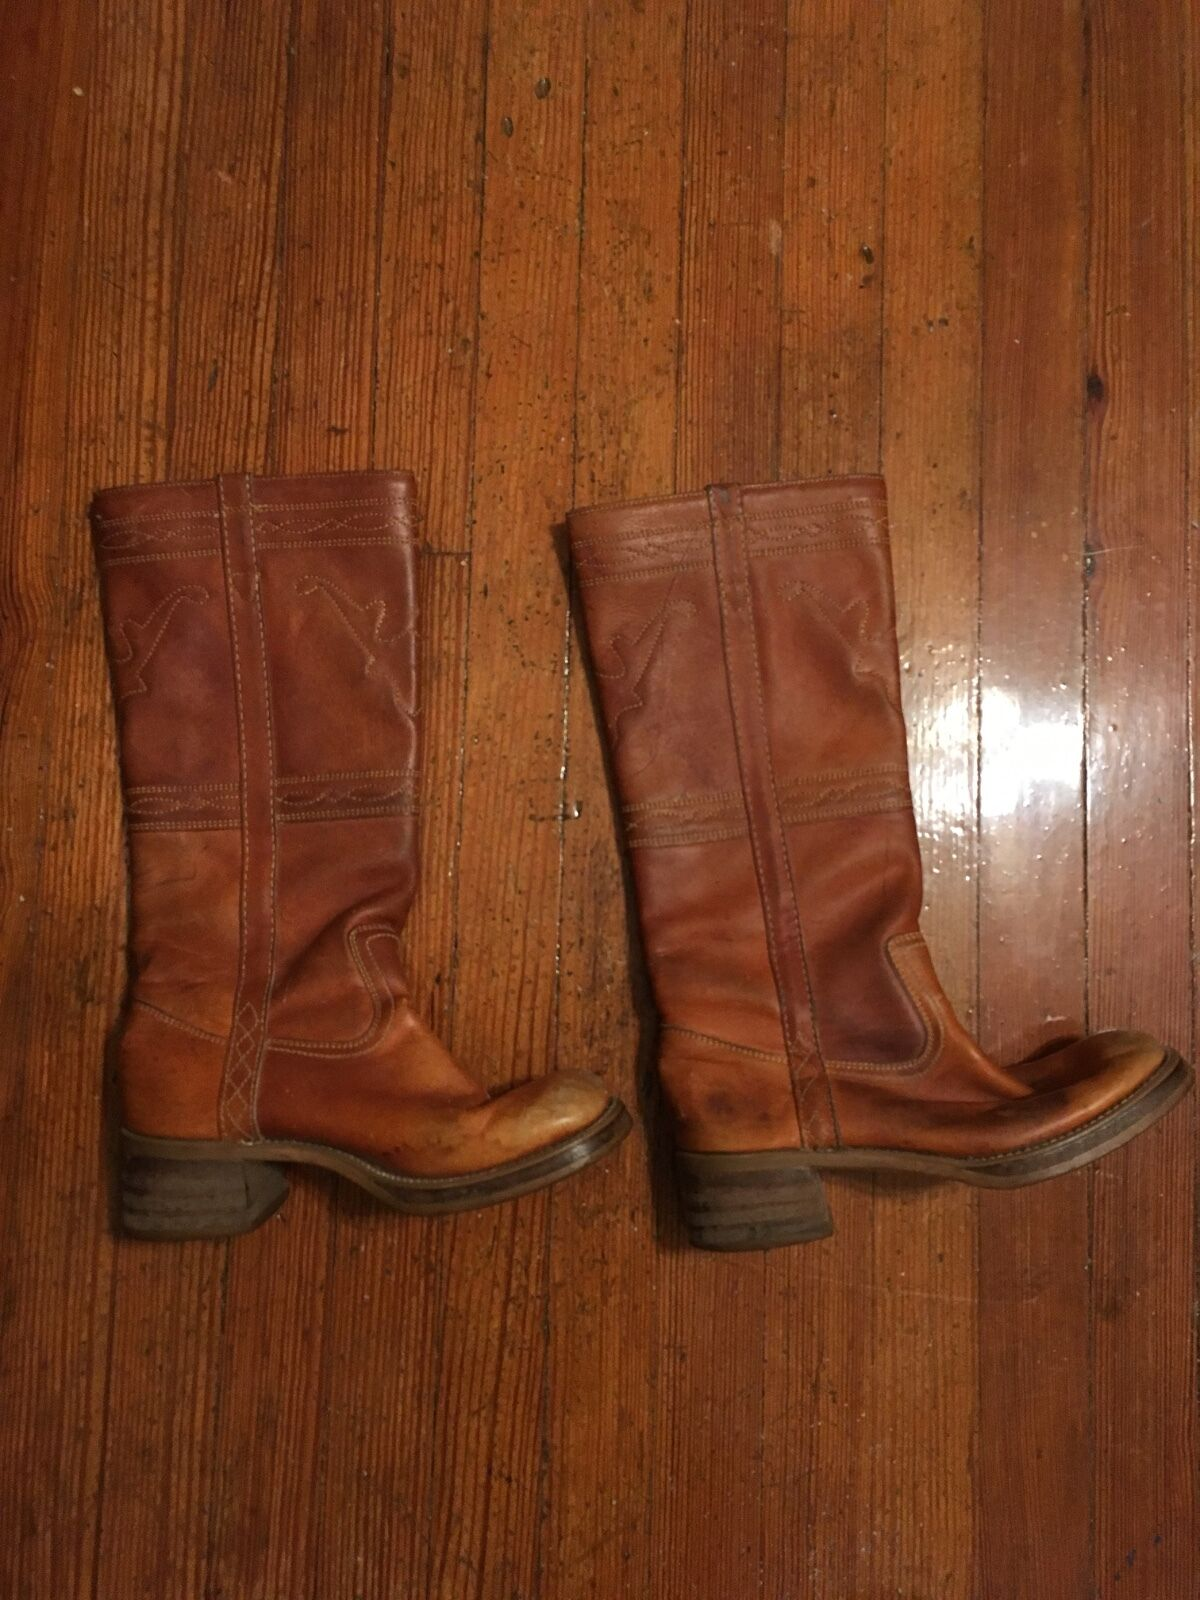 vintage women's Frye boots size 71/2 M